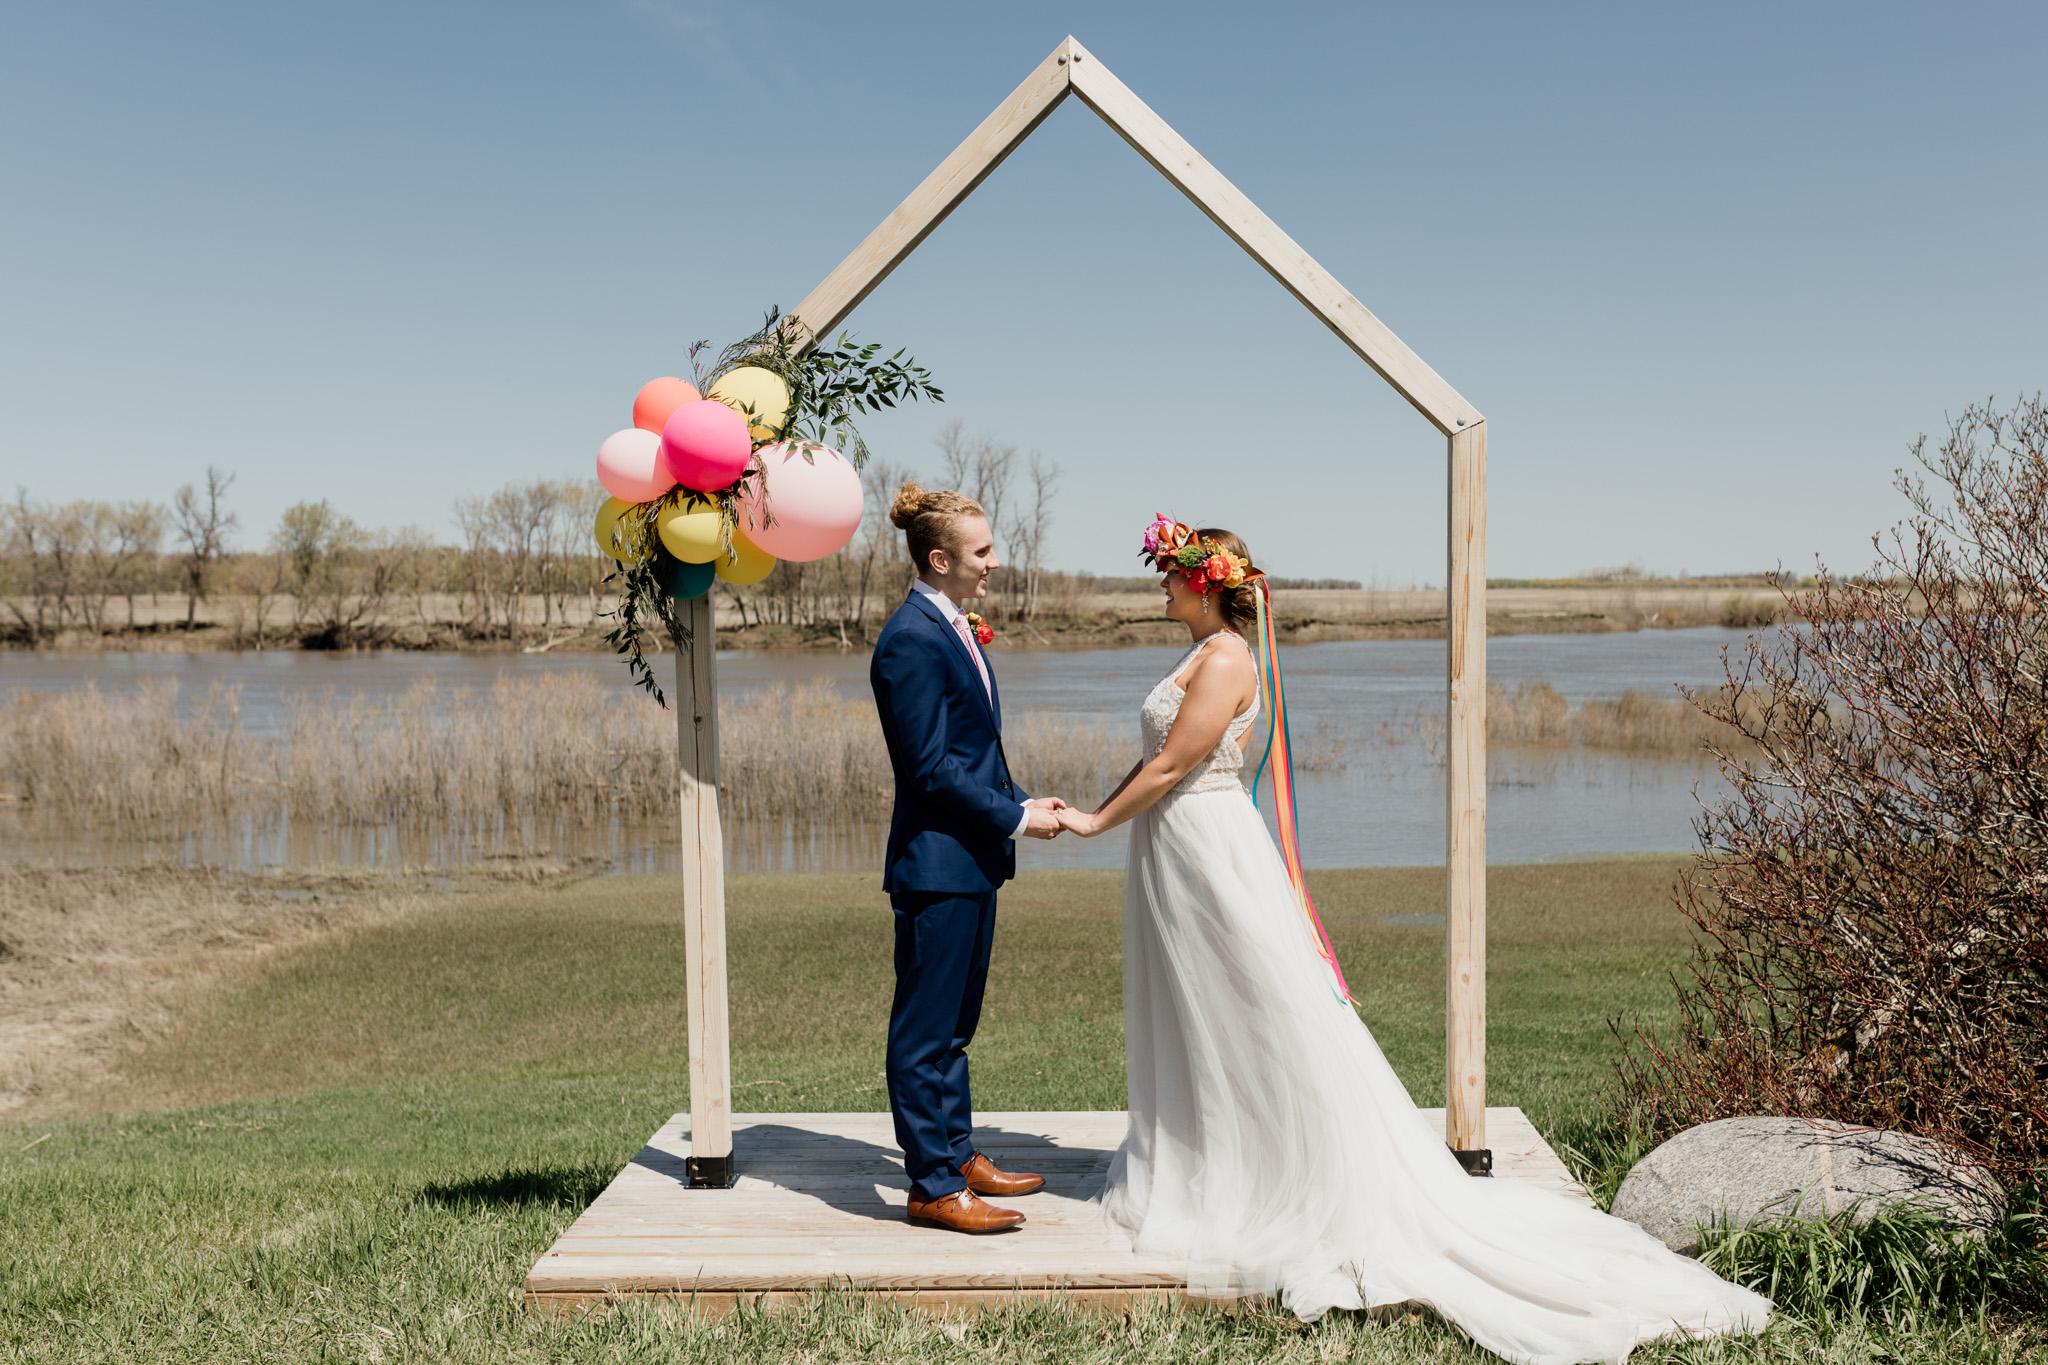 winnipeg-wedding-starlit point-26.jpg